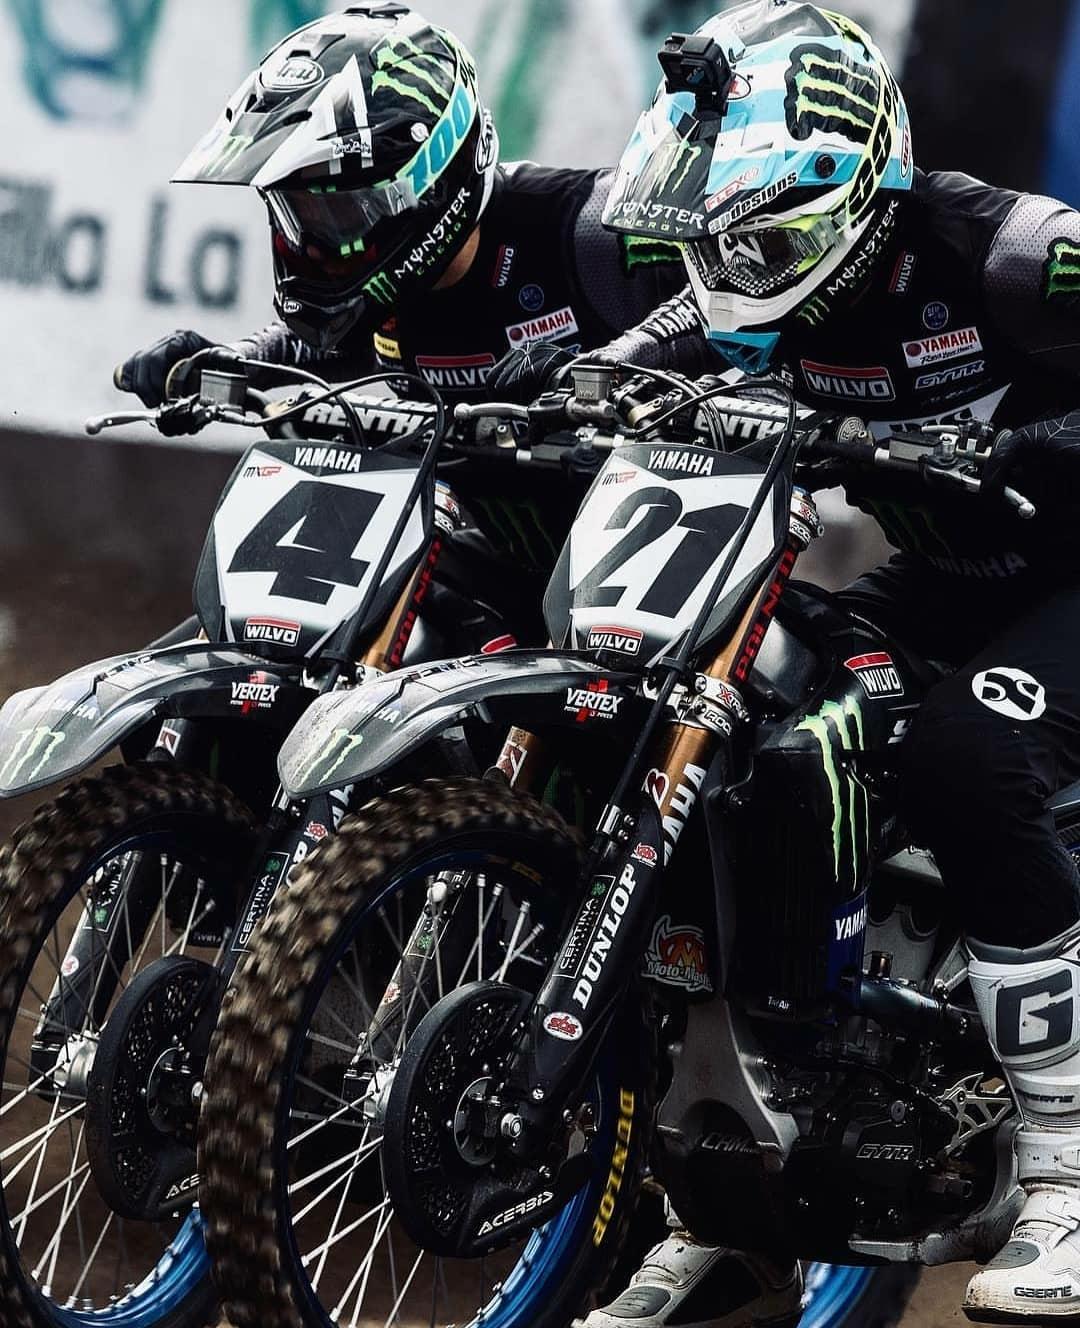 yamaha motocross racers side by side